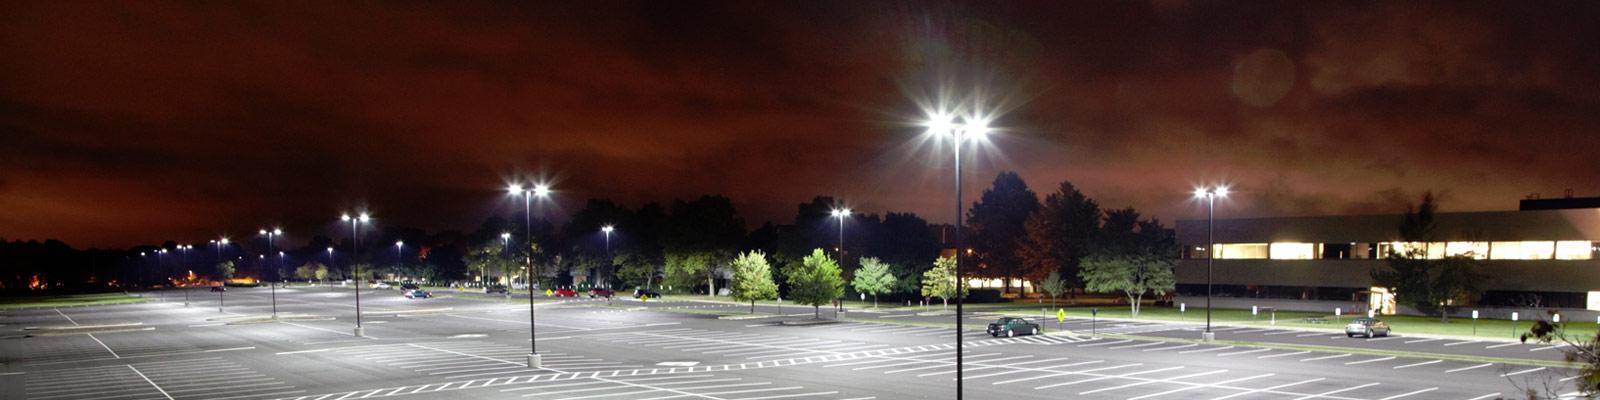 Parking-Lot-Lighting